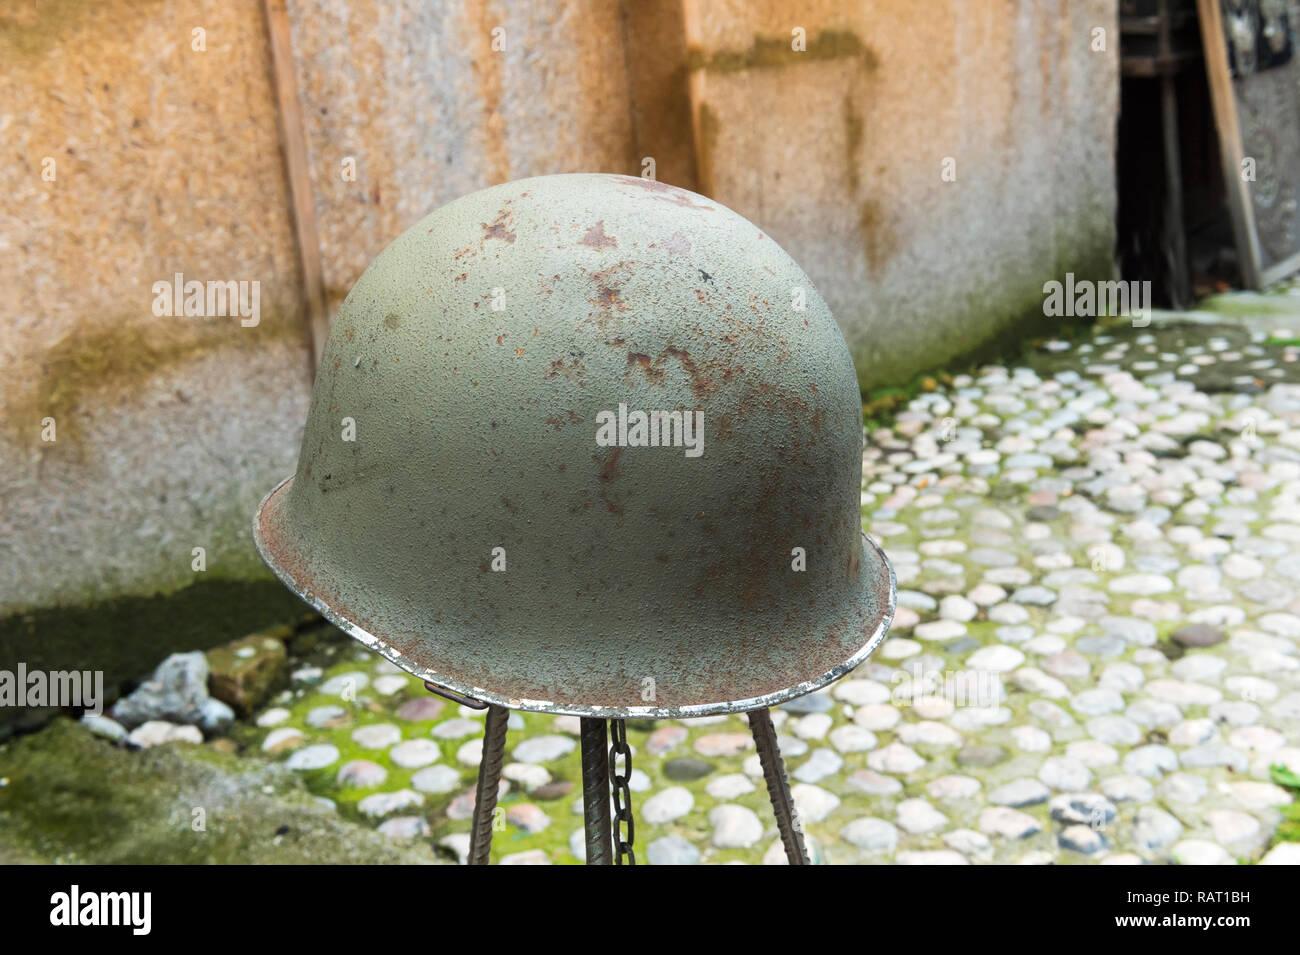 Helmet dating from the war with Serbia for sale, Bascarsija Bazar, Sarajevo, Bosnia and Herzegovina - Stock Image